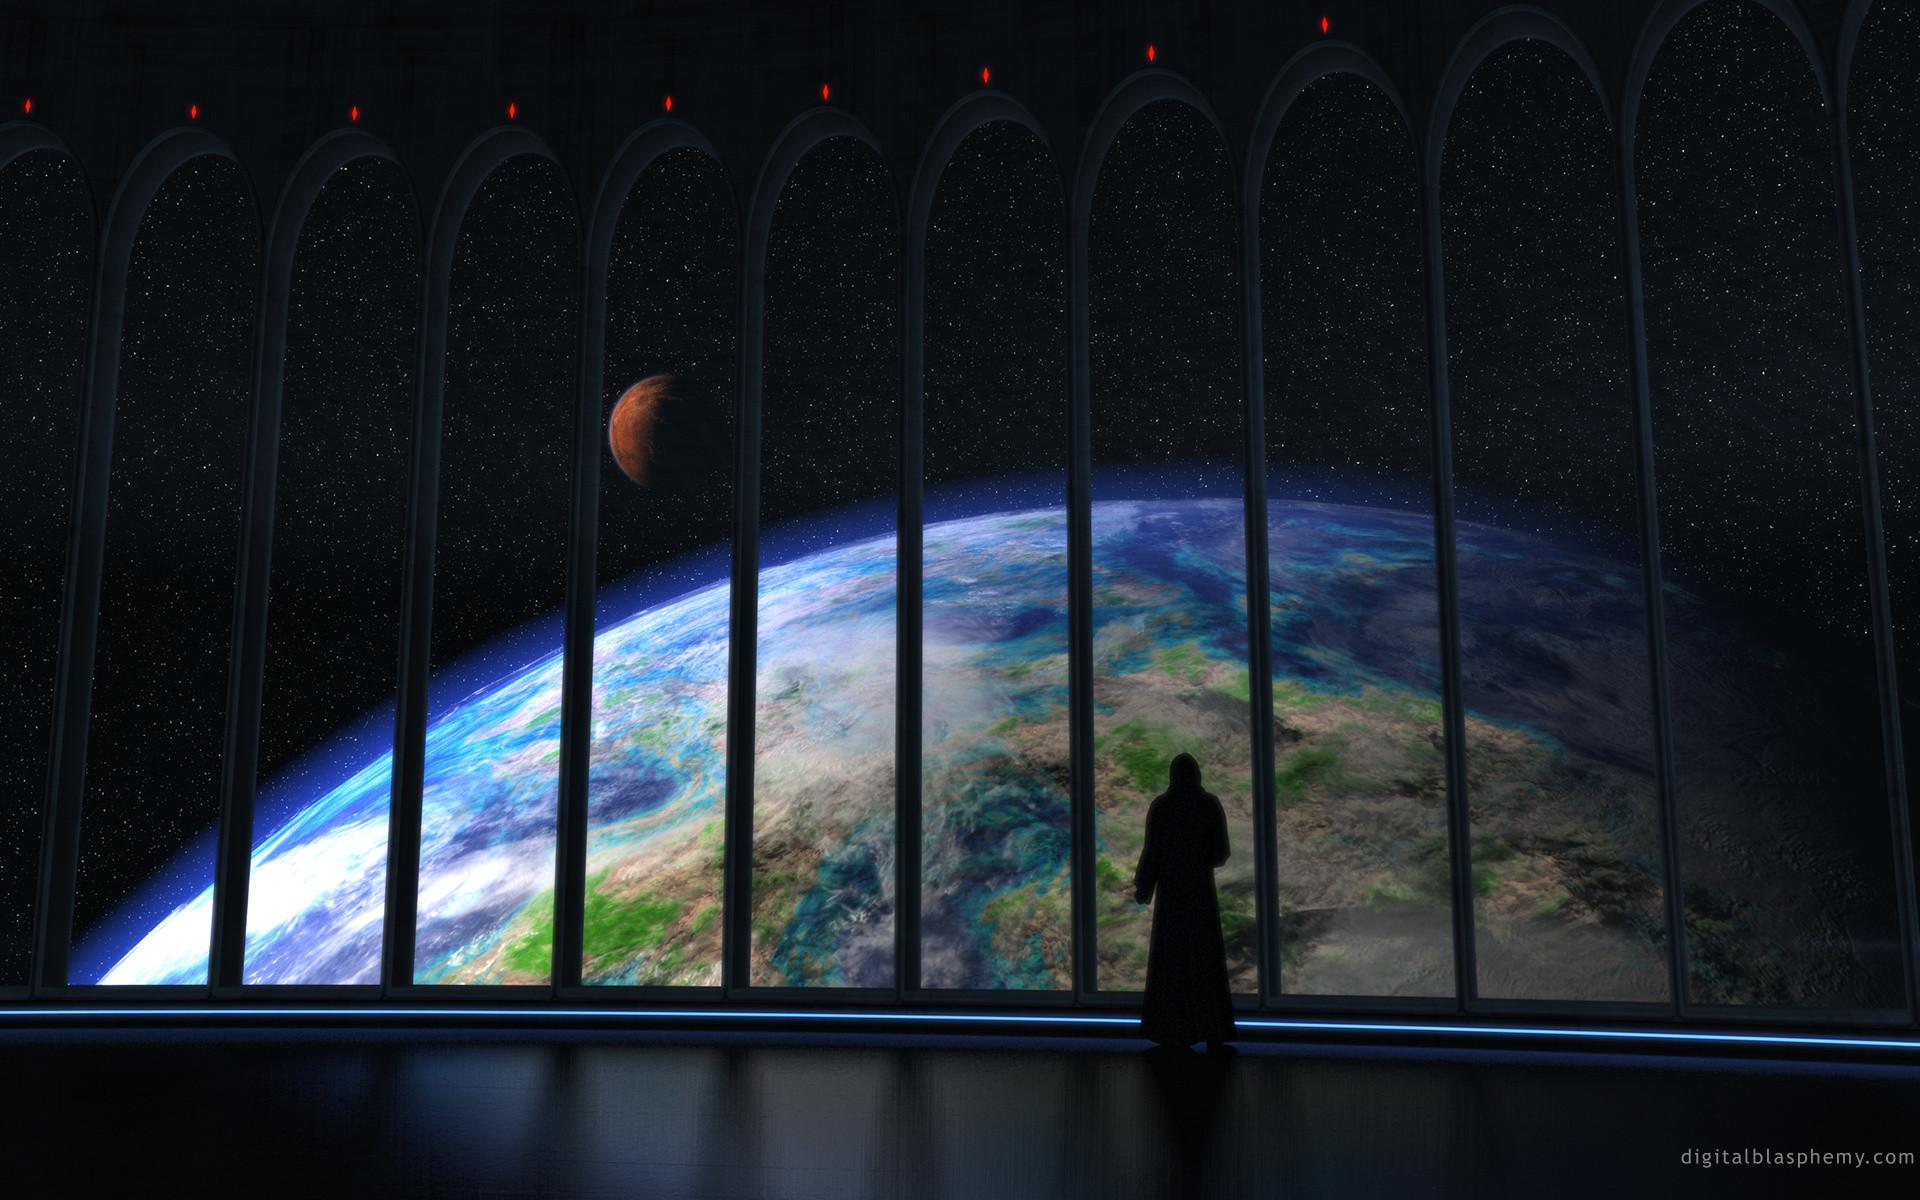 star-wars-earth-planet-free-desktop-background.jpg 1,920